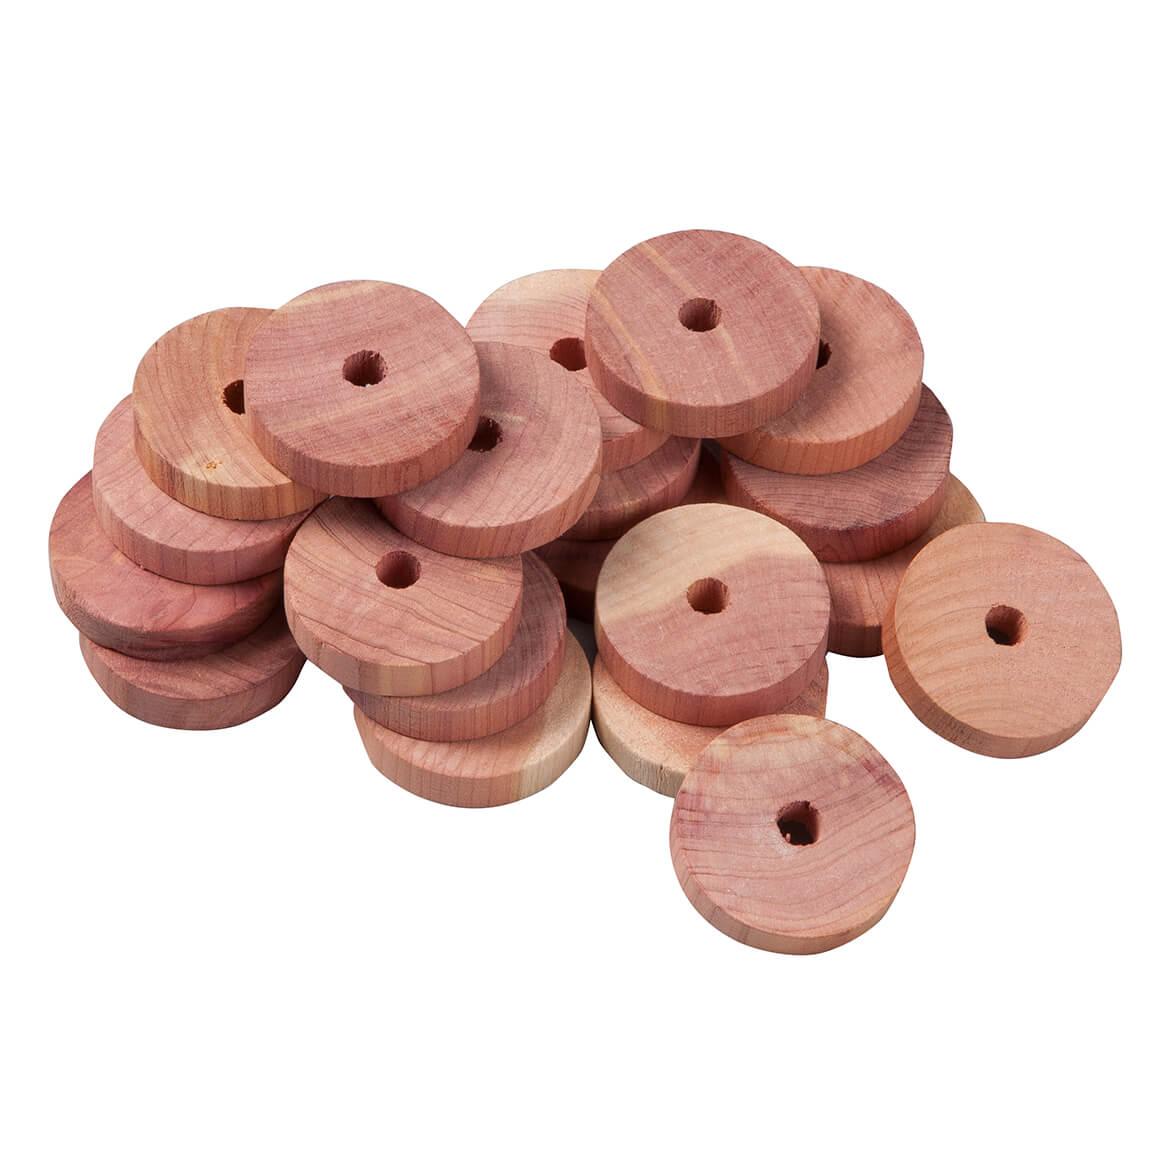 Cedar Hanger Discs, Set of 20 by OakRidge Accents™-357951